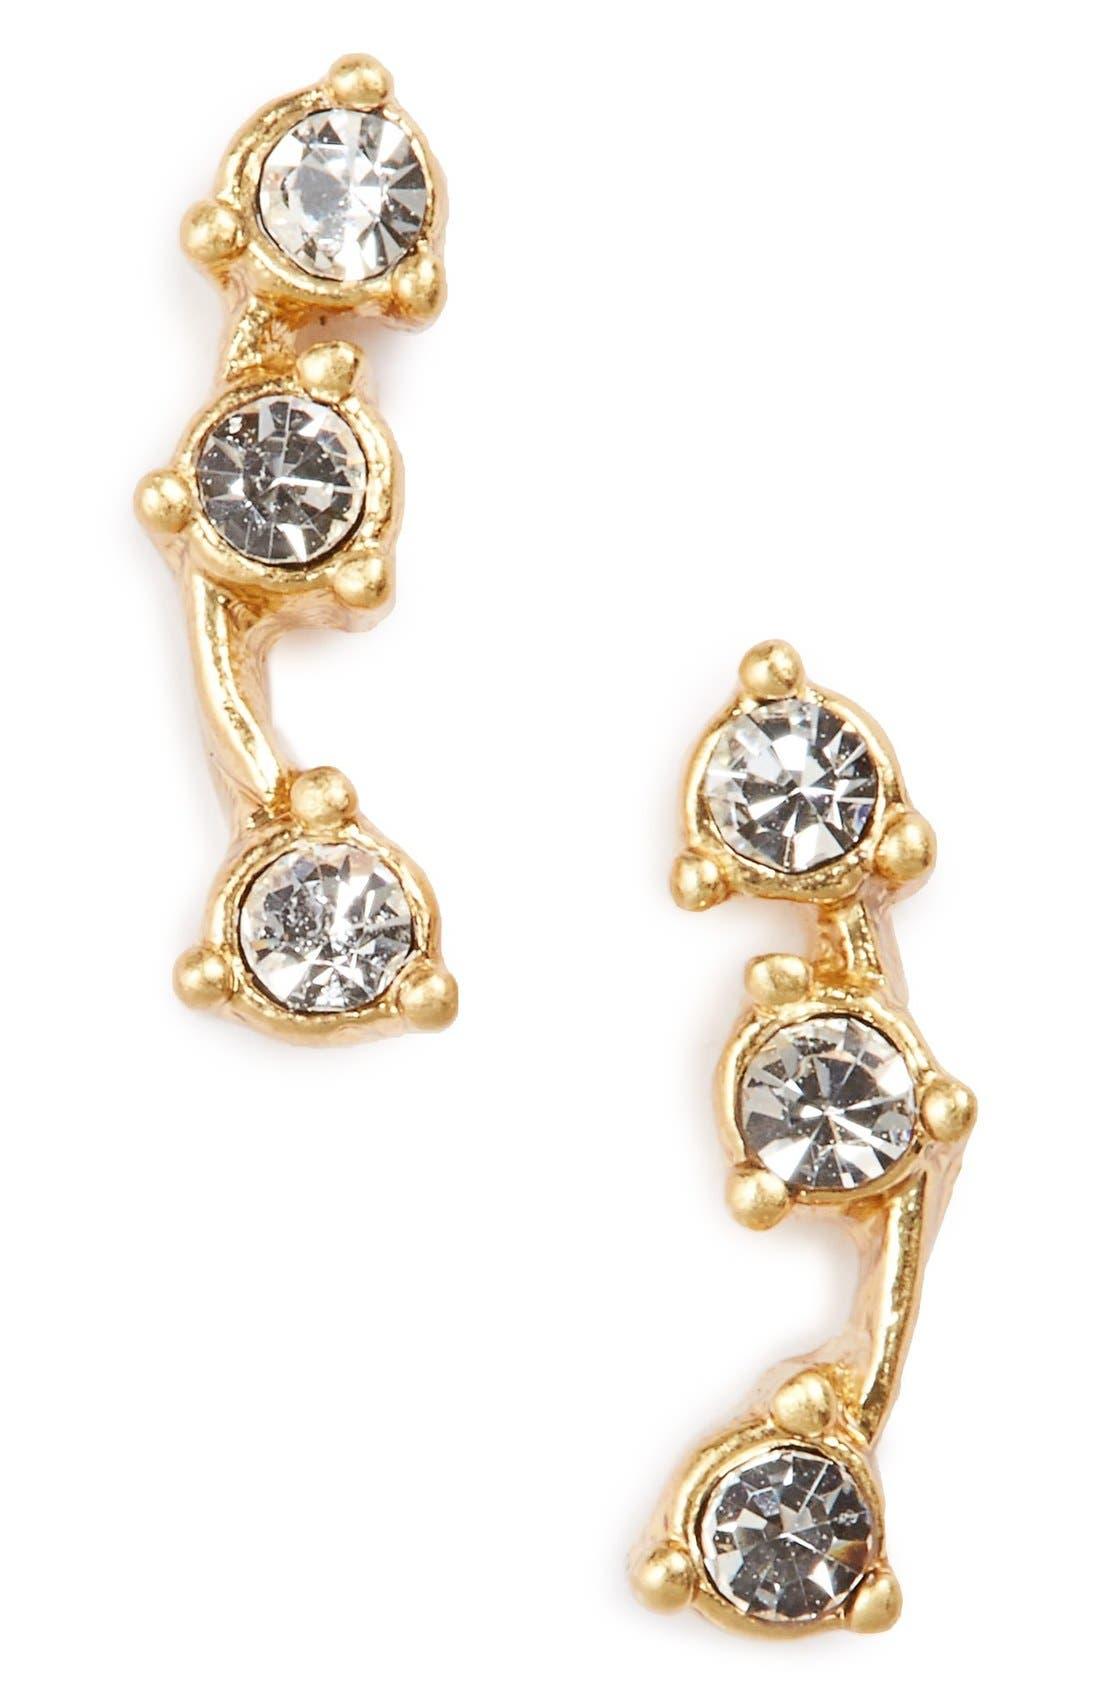 Gemline Stud Earrings,                             Main thumbnail 1, color,                             001